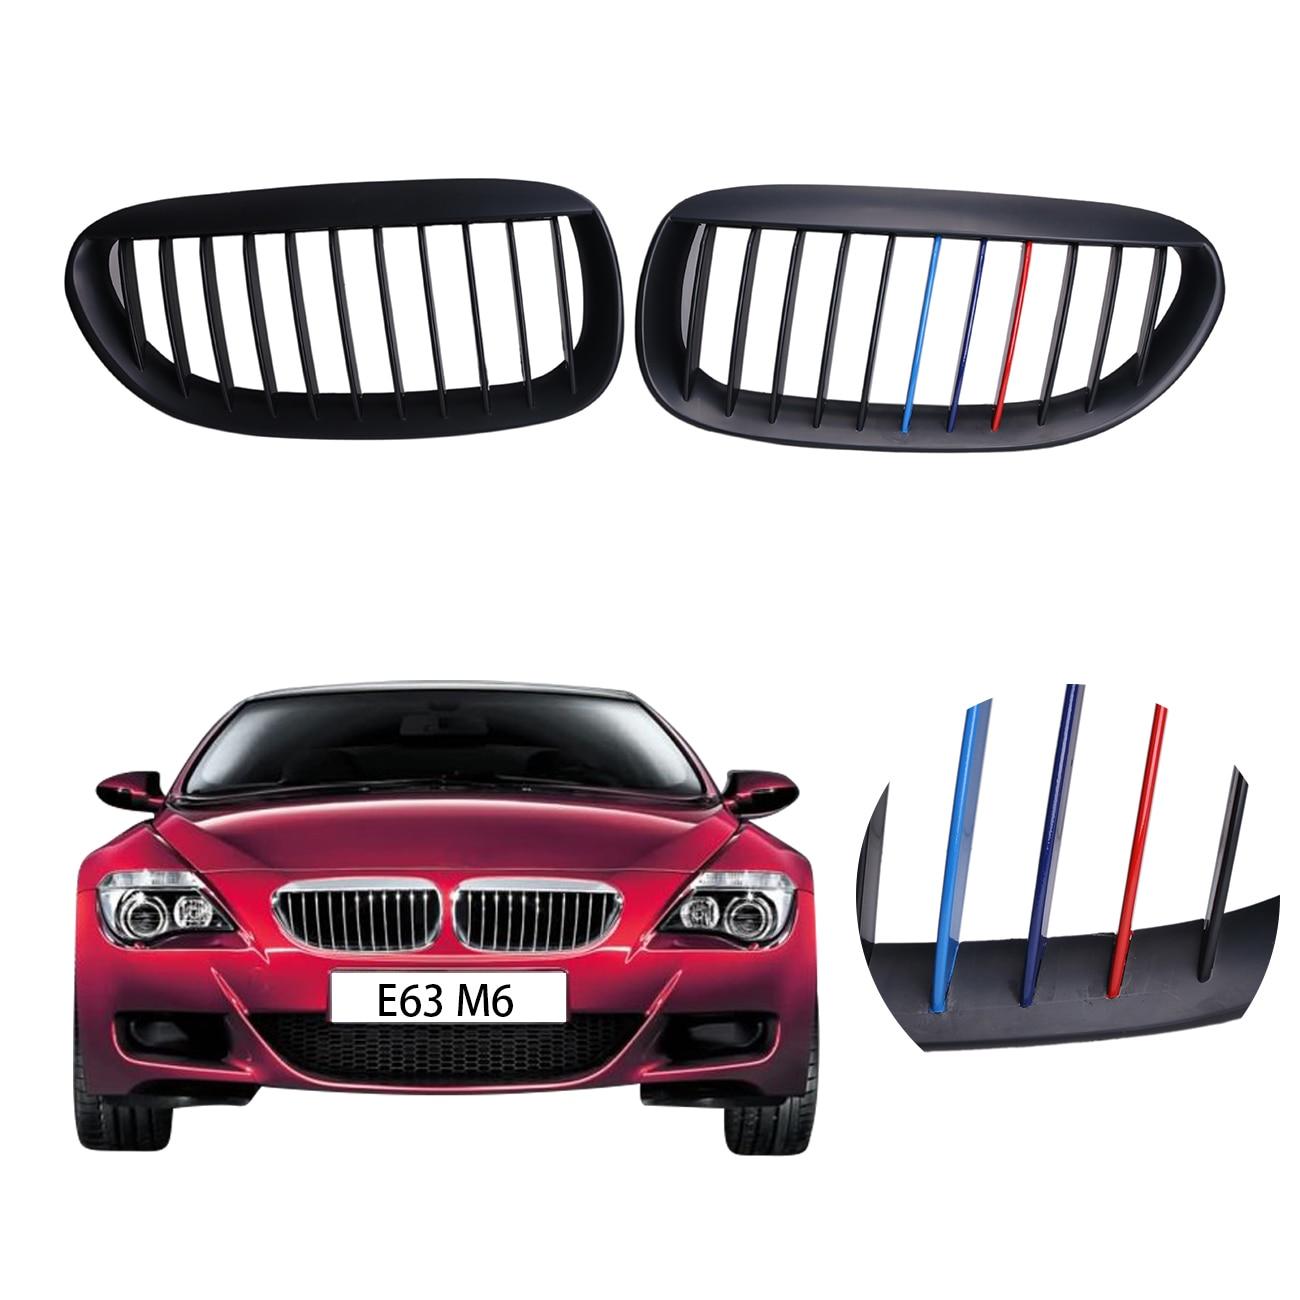 Car Kidney Shape Grill Front Grille For BMW M6 E63 E64 645i 650i Convertible Coupe 2004 2010 Matte Black M Color .# CASE